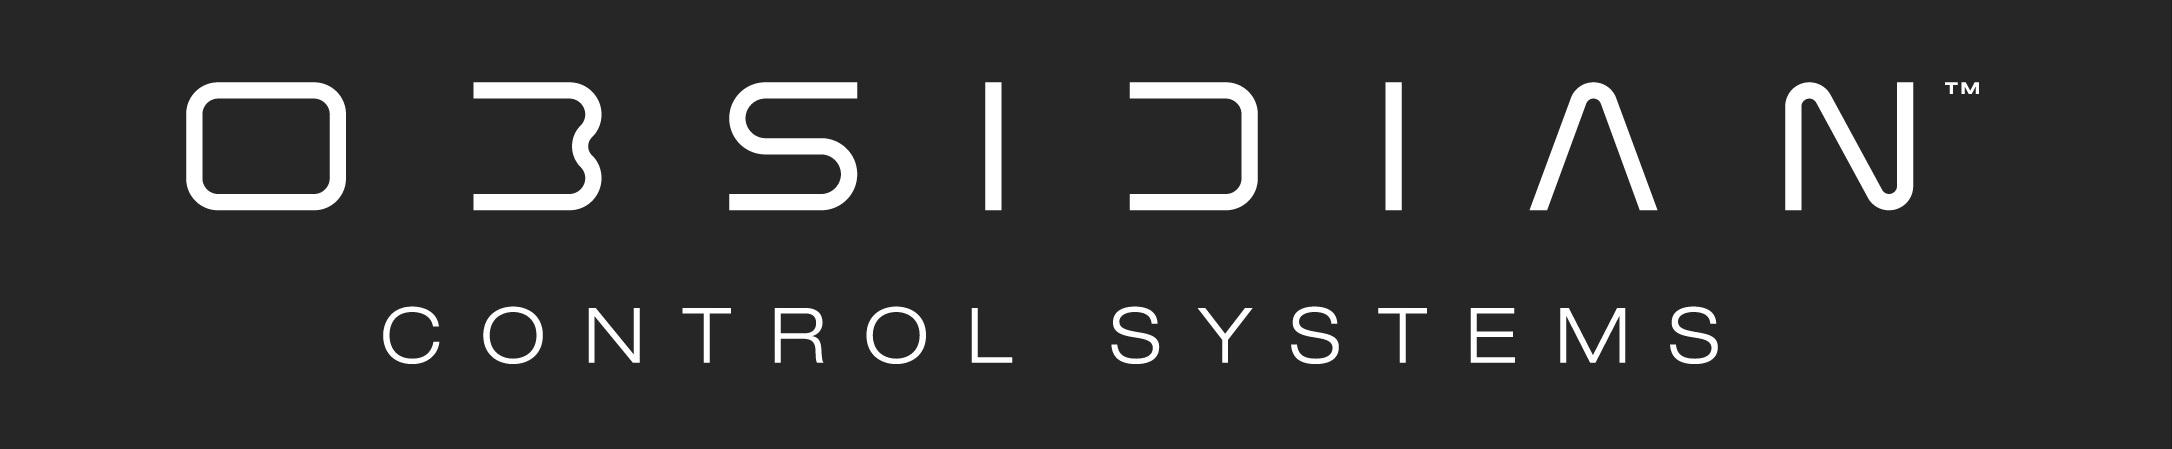 Obsidian Control Systems